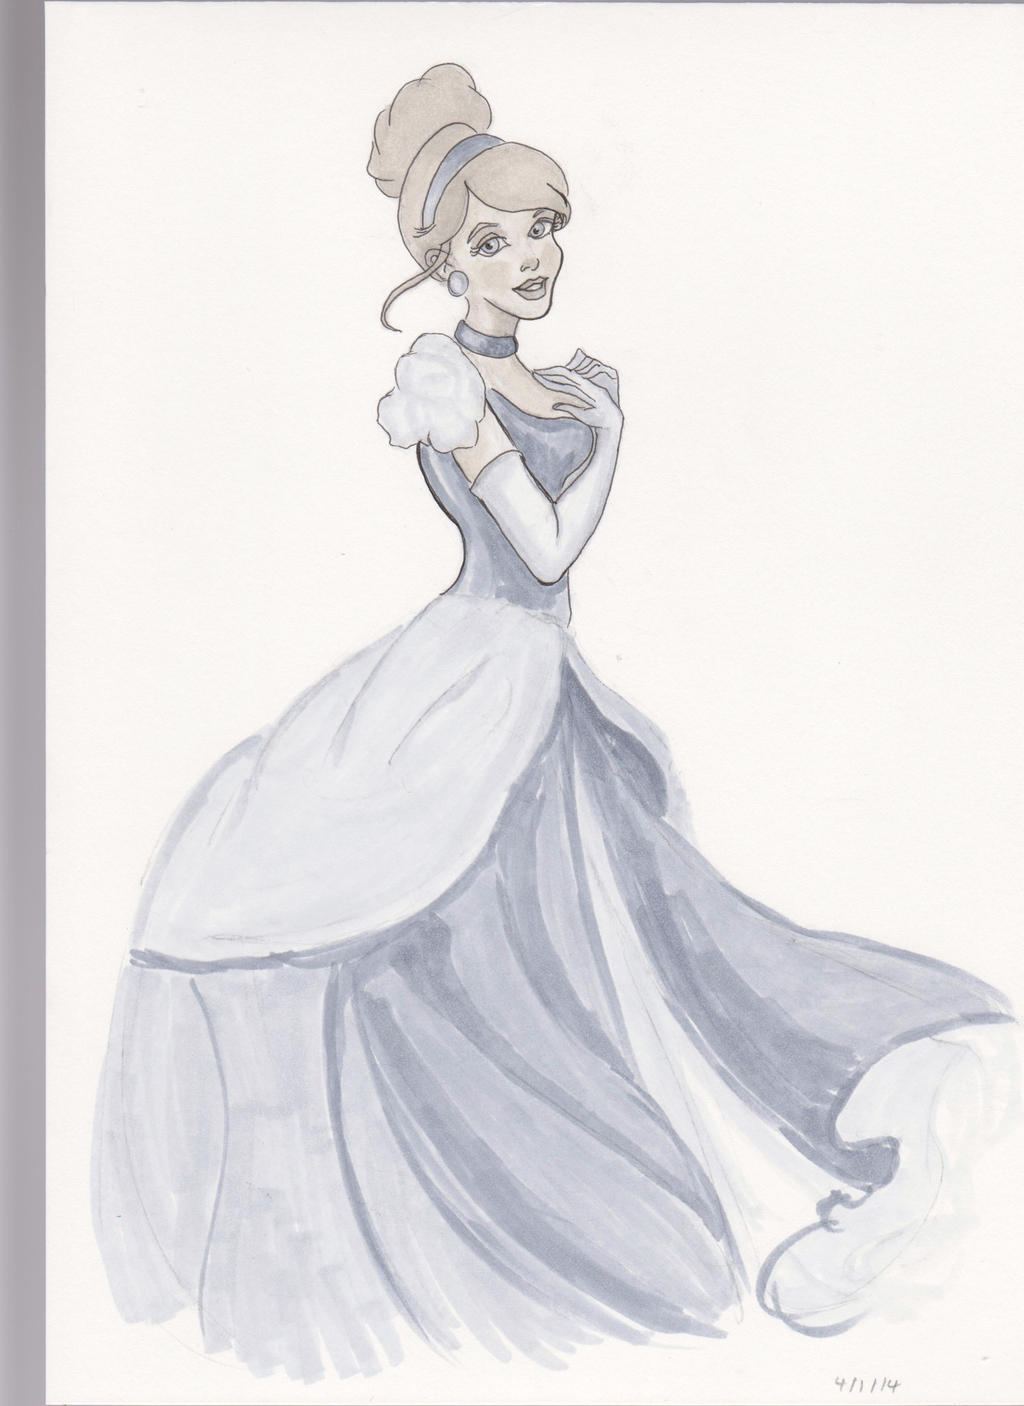 Cinderella copic ciao sketch by monkeygareth on DeviantArt